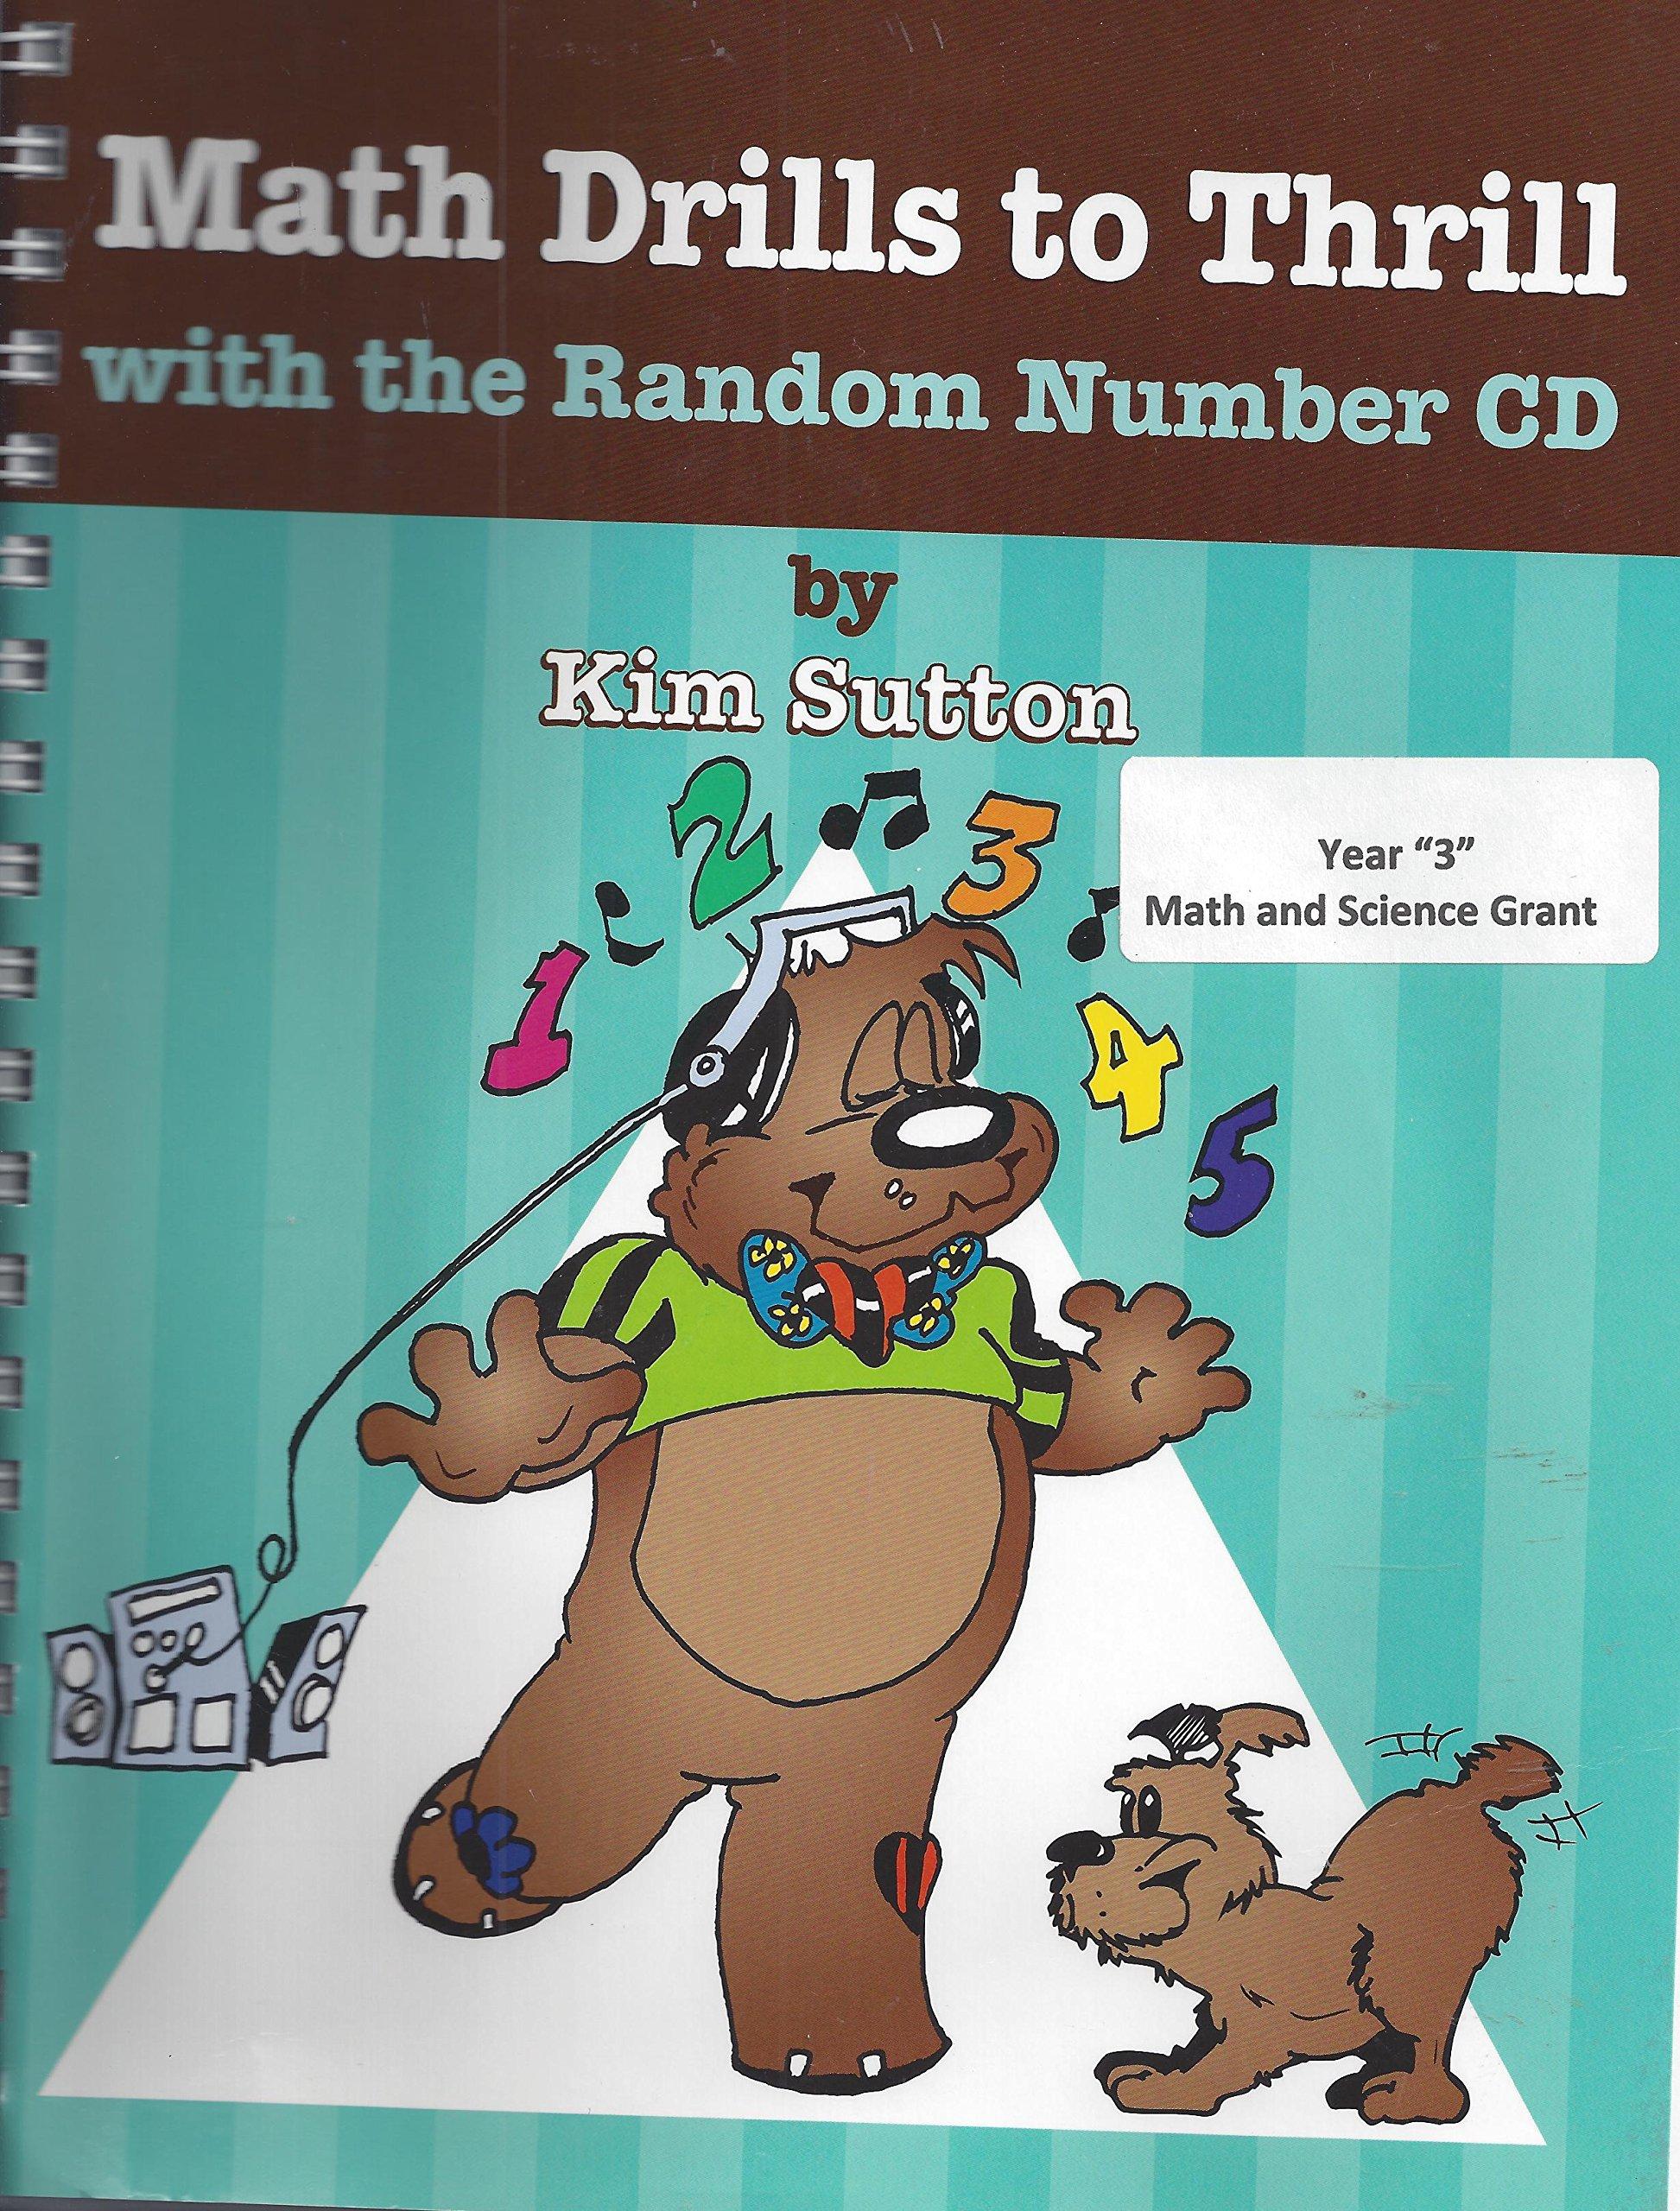 Math Drills to Thrill with Random Number CD: Kim Sutton ...